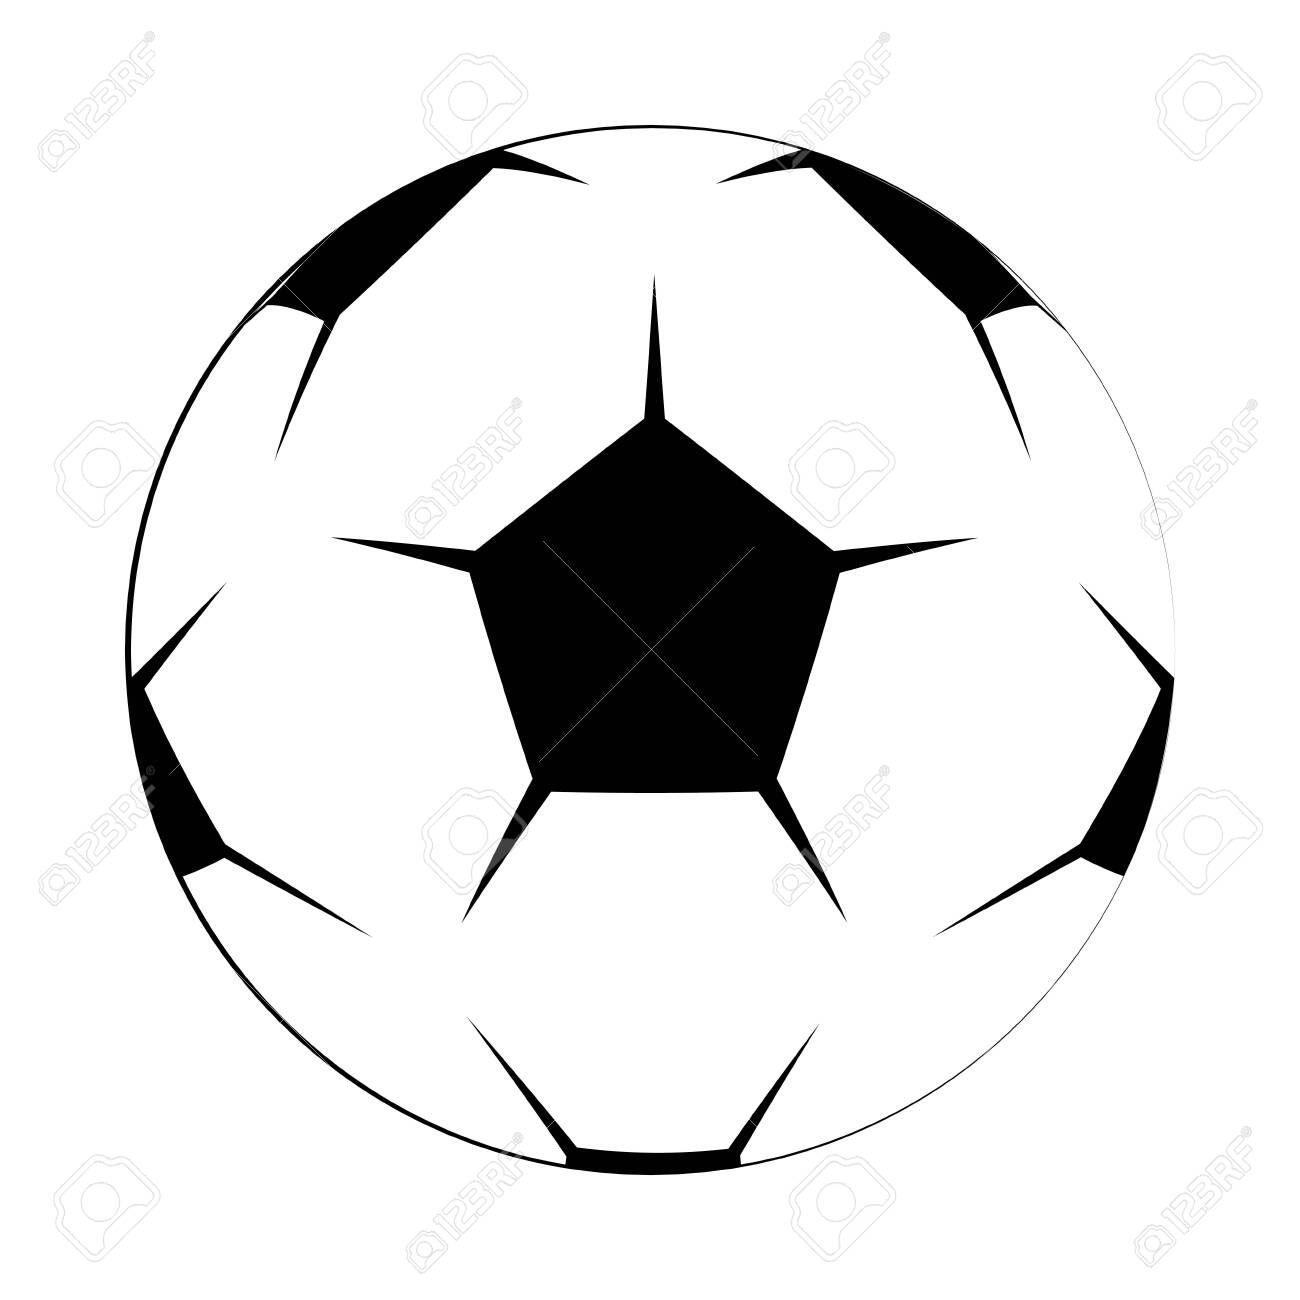 Soccer Football Ball Equipment Cartoon Isolated Vector Illustration Graphic Design Aff Equipment Cartoon Ball So Graphic Design Football Ball Soccer